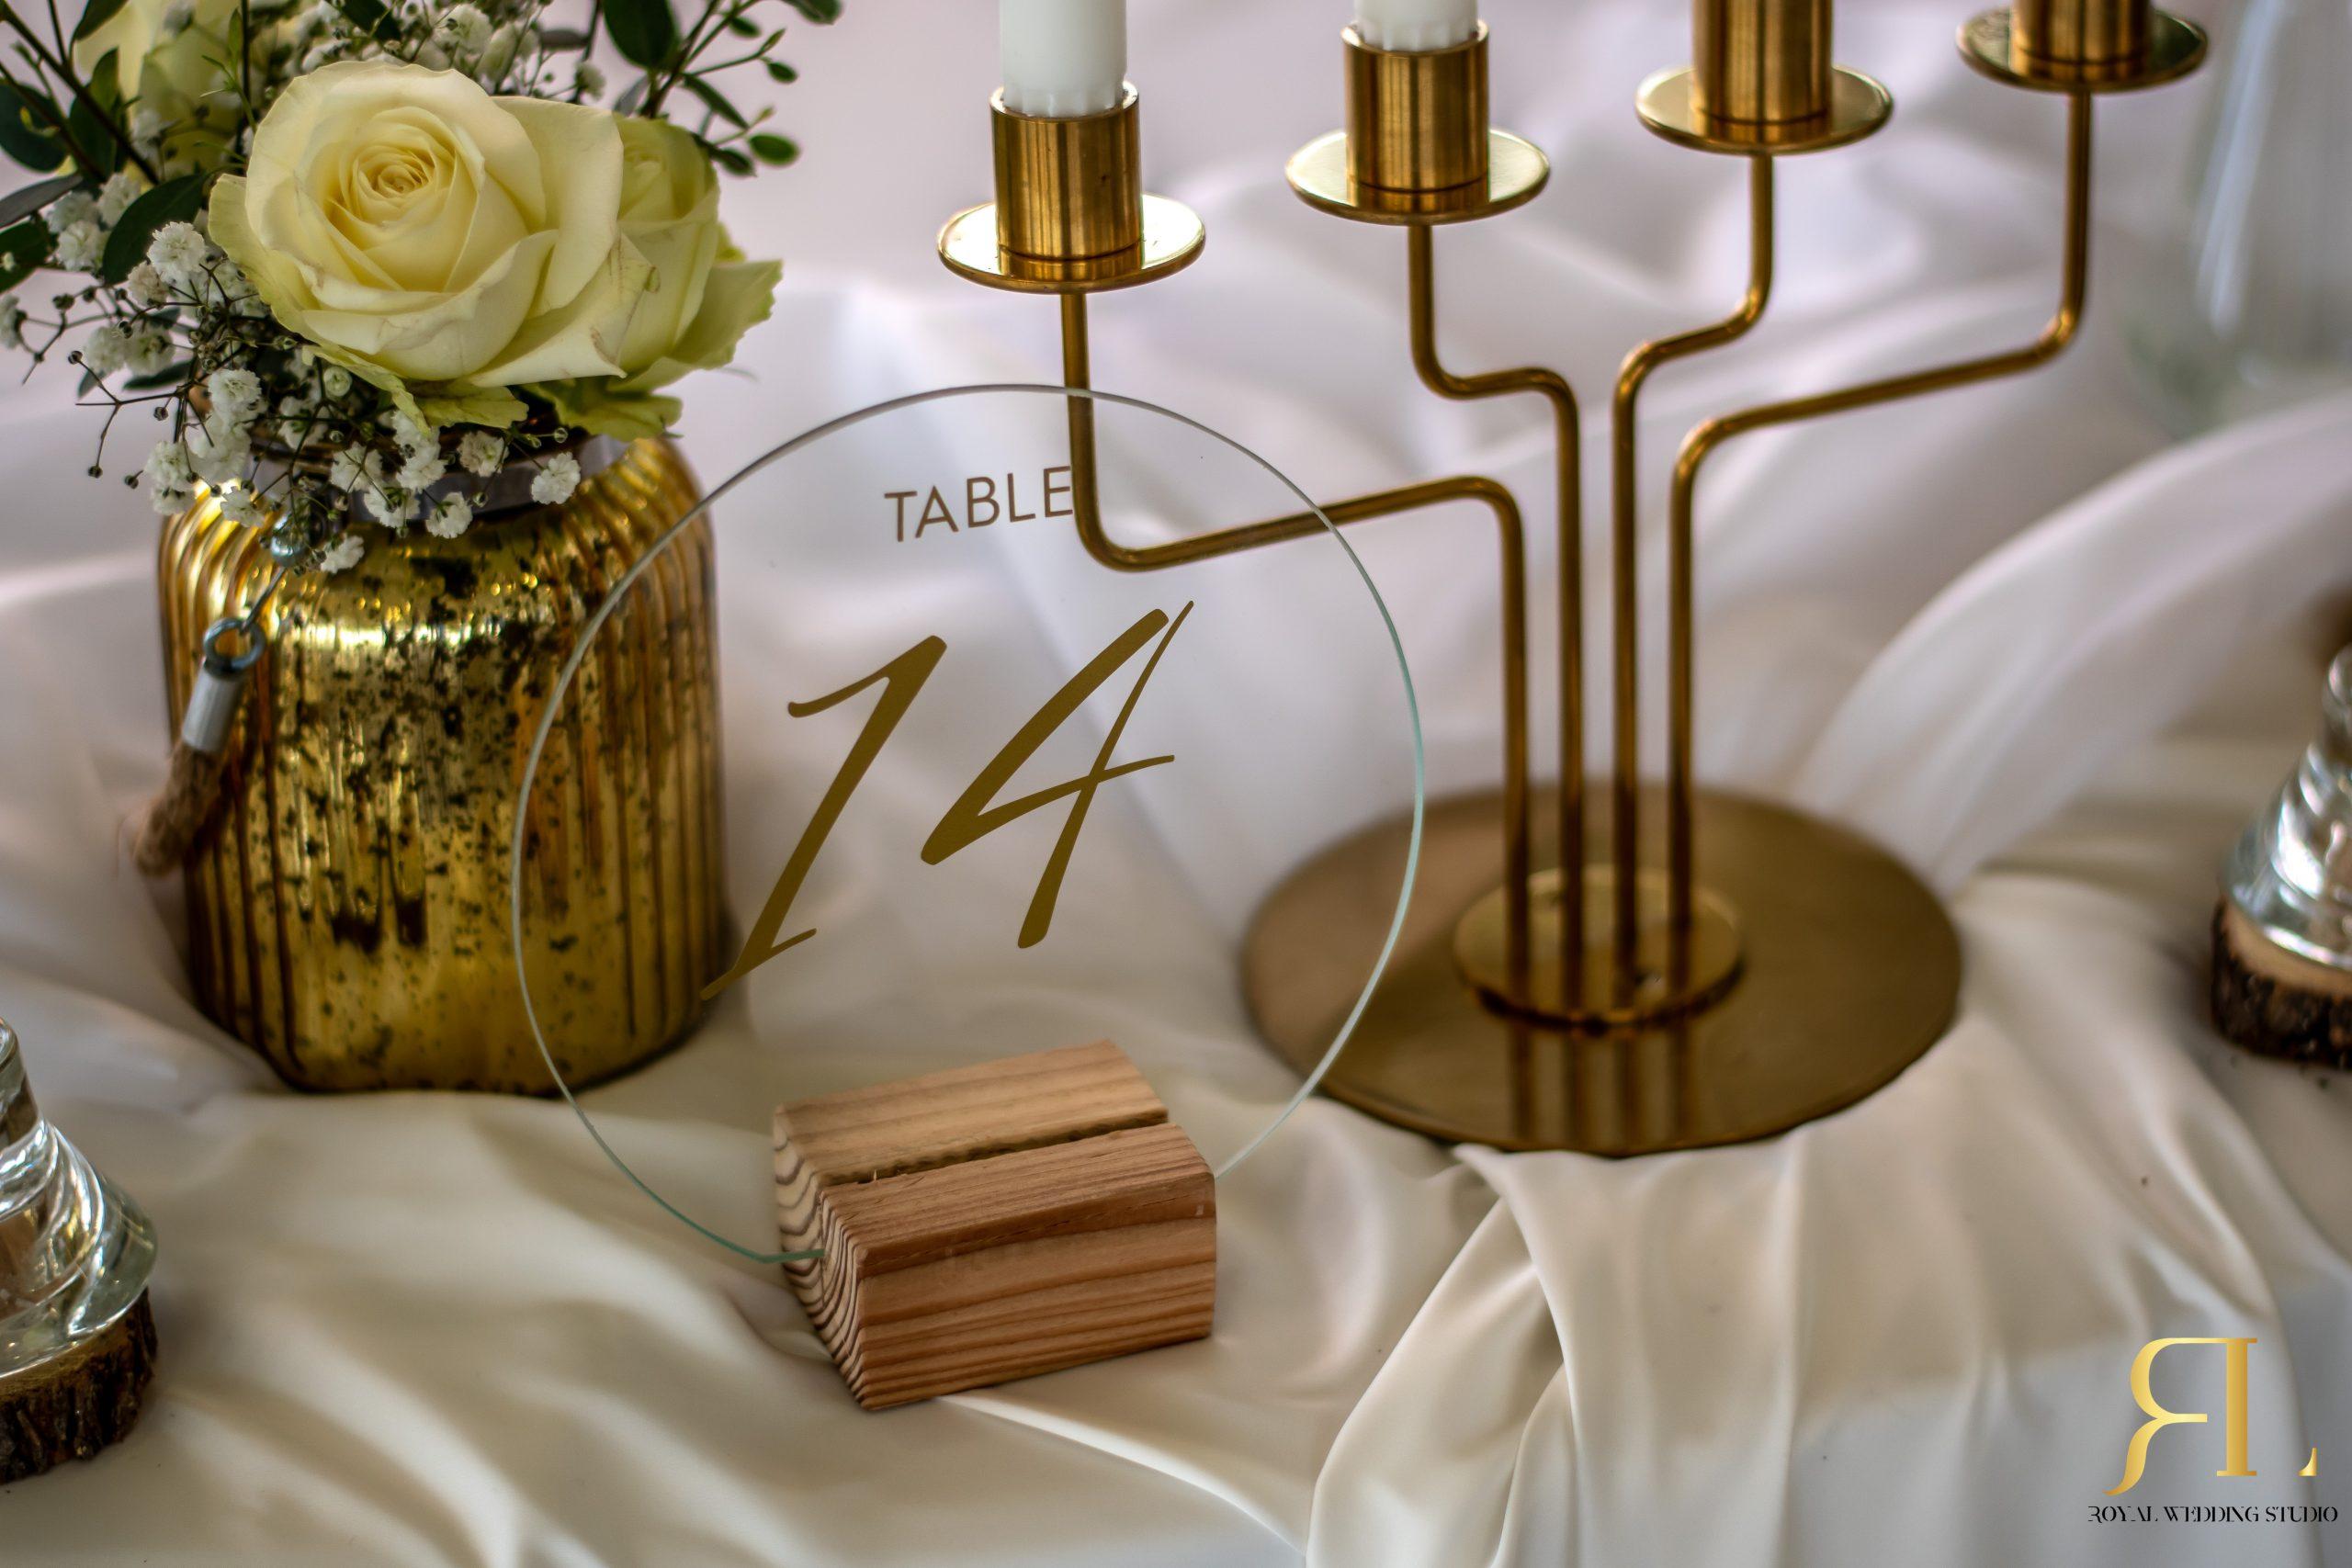 Numerizacija stolova